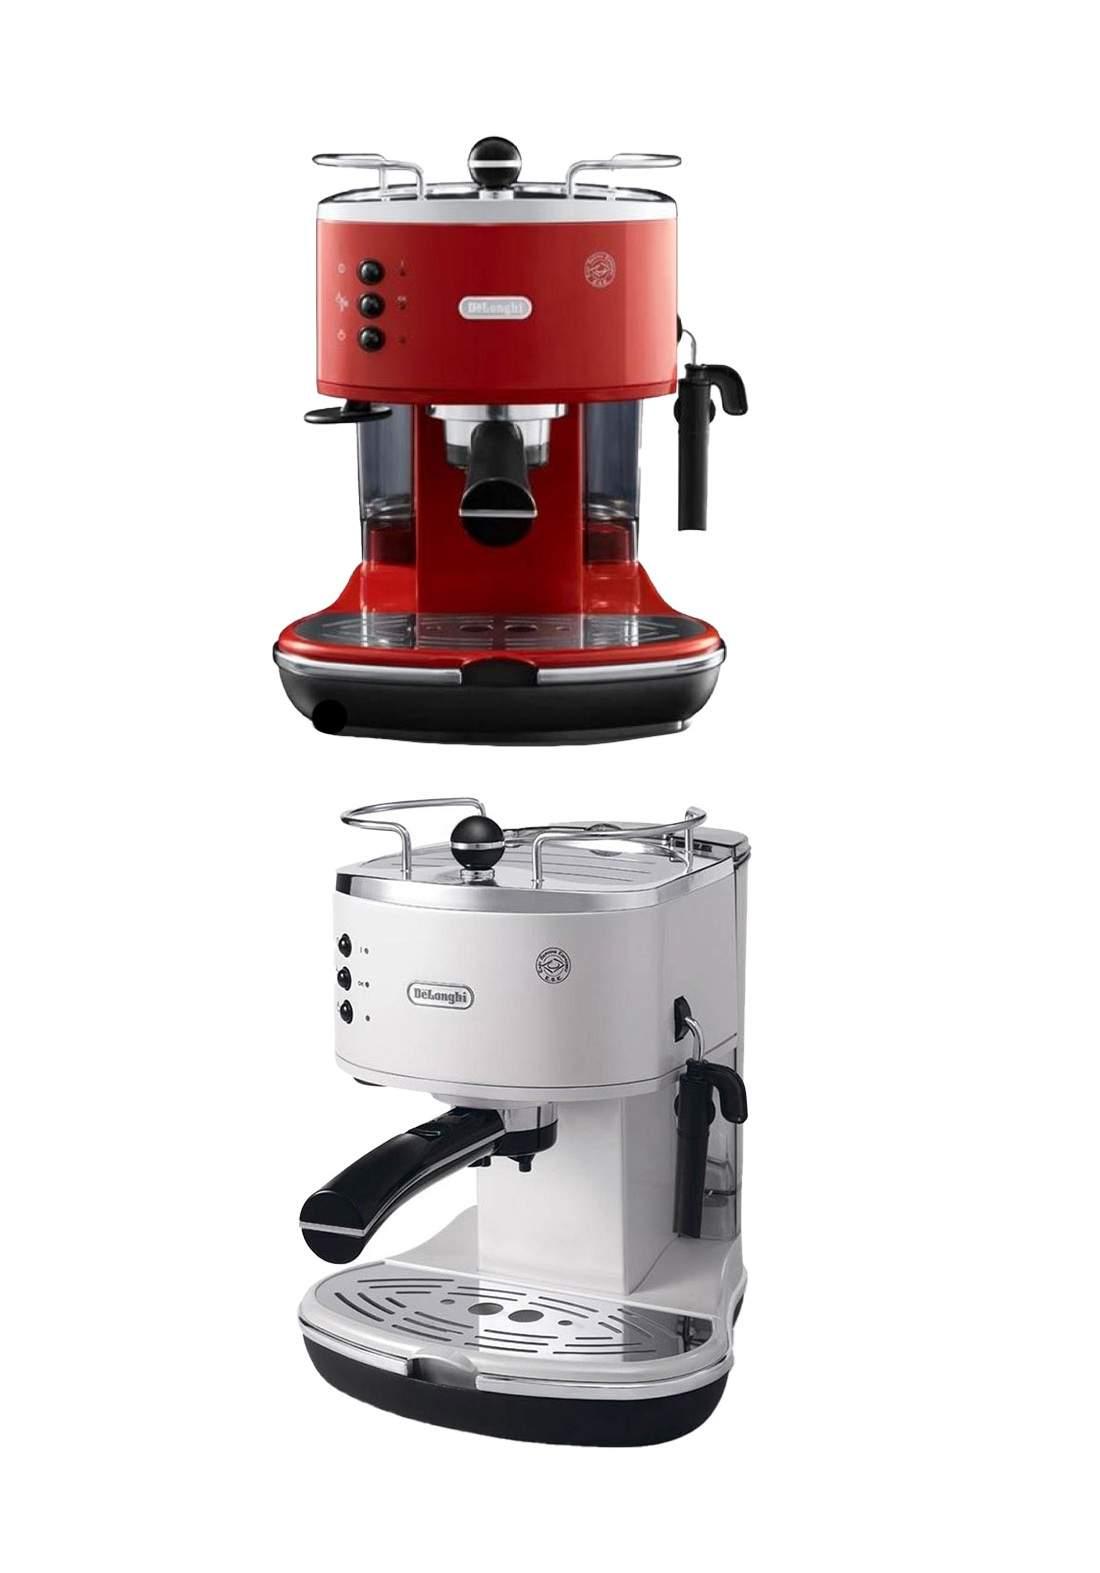 Delonghi ECO311.R Coffee Machine 1100 Watt ماكنة صنع قهوة